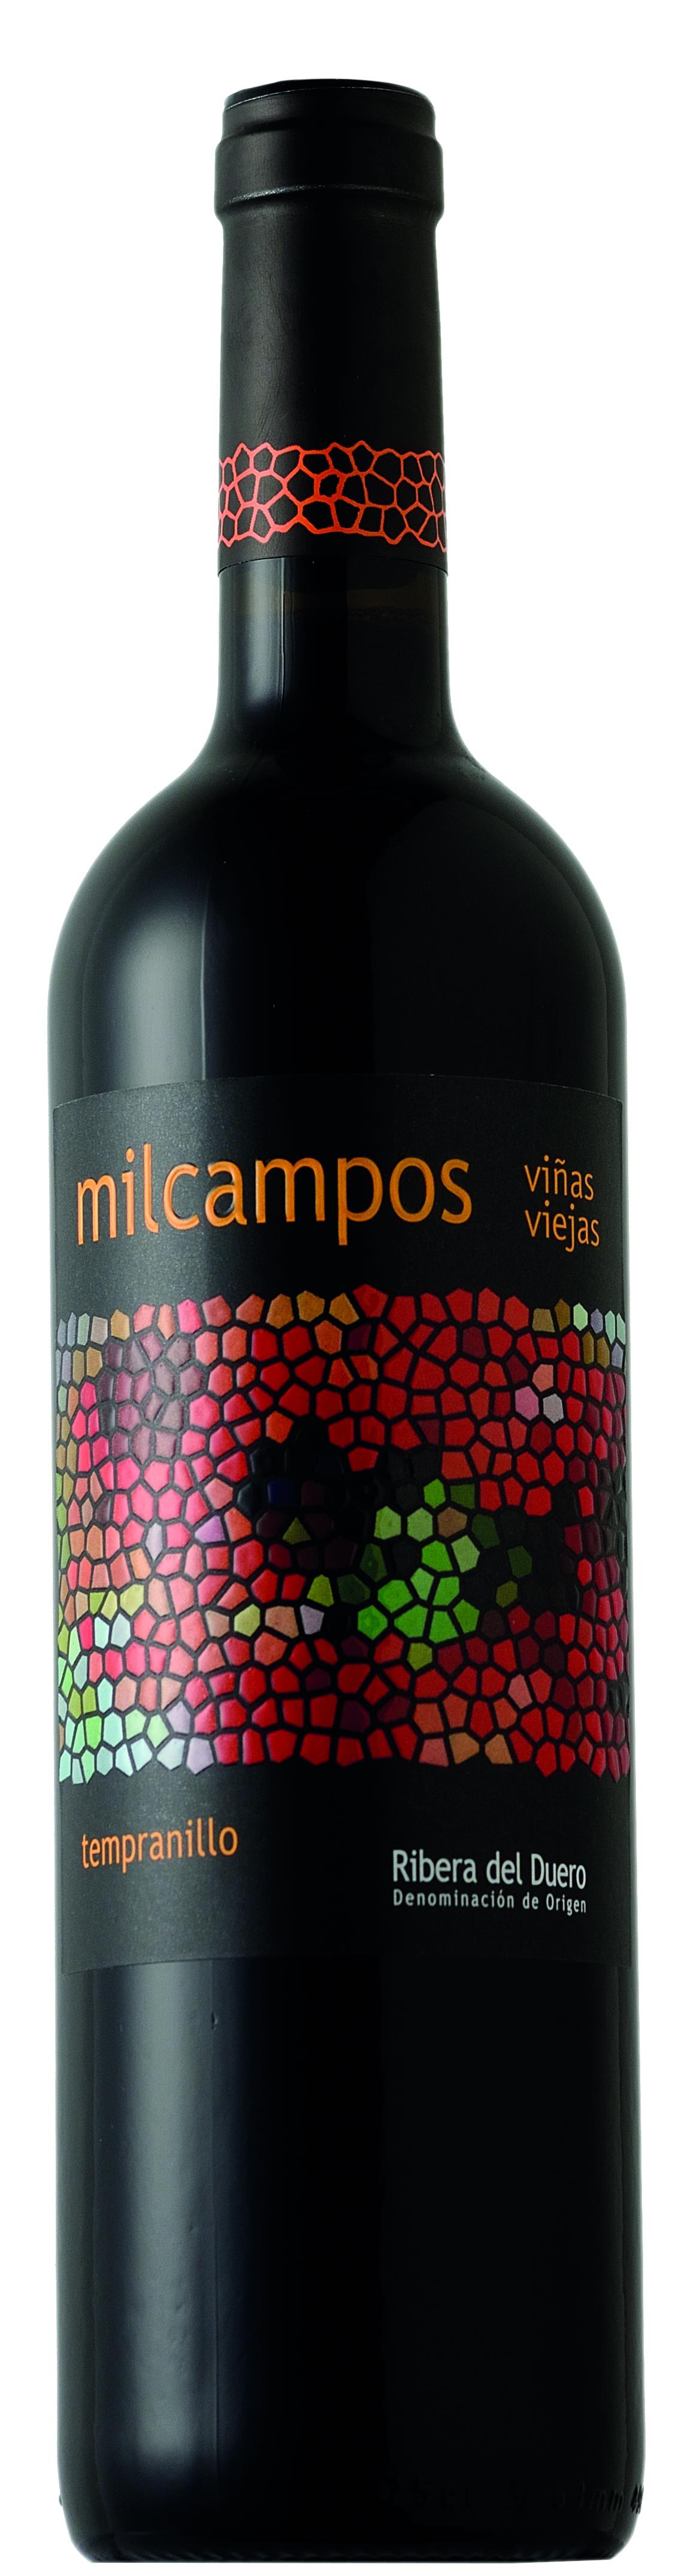 Vinho Tinto Milcampos Viñas Viejas Ribera Del Duero 2014 - Grand Cru